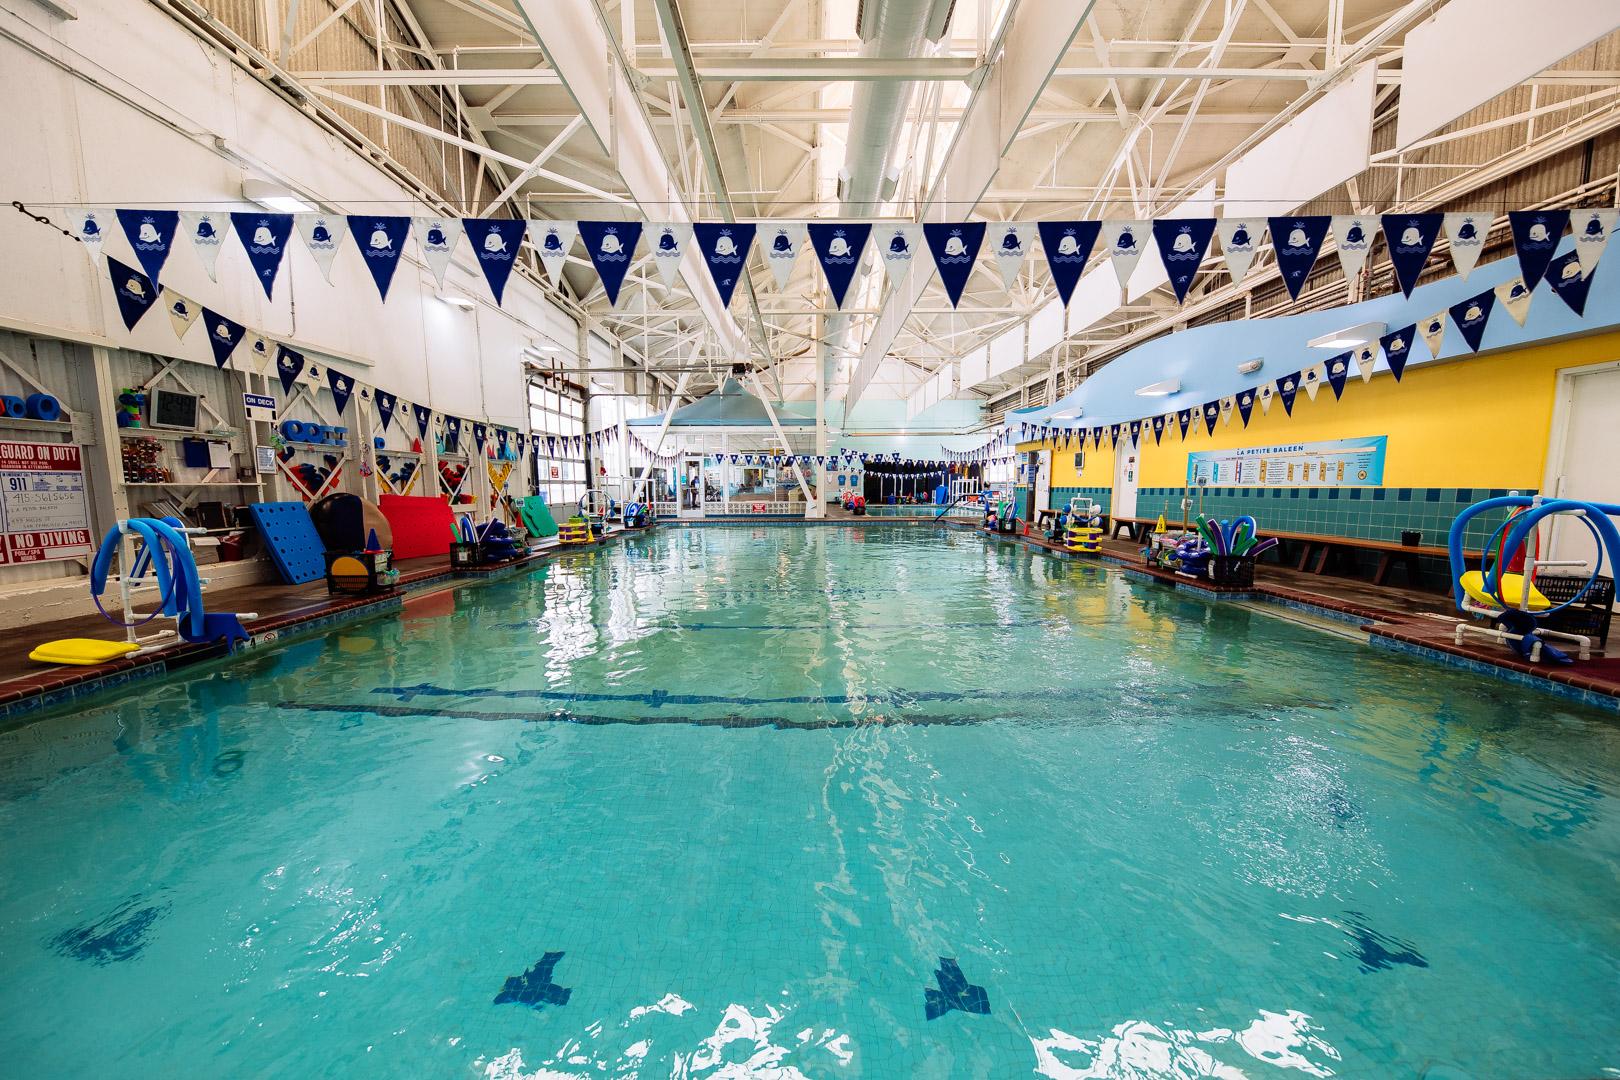 Swim Schools Pool in San Francisco, CA